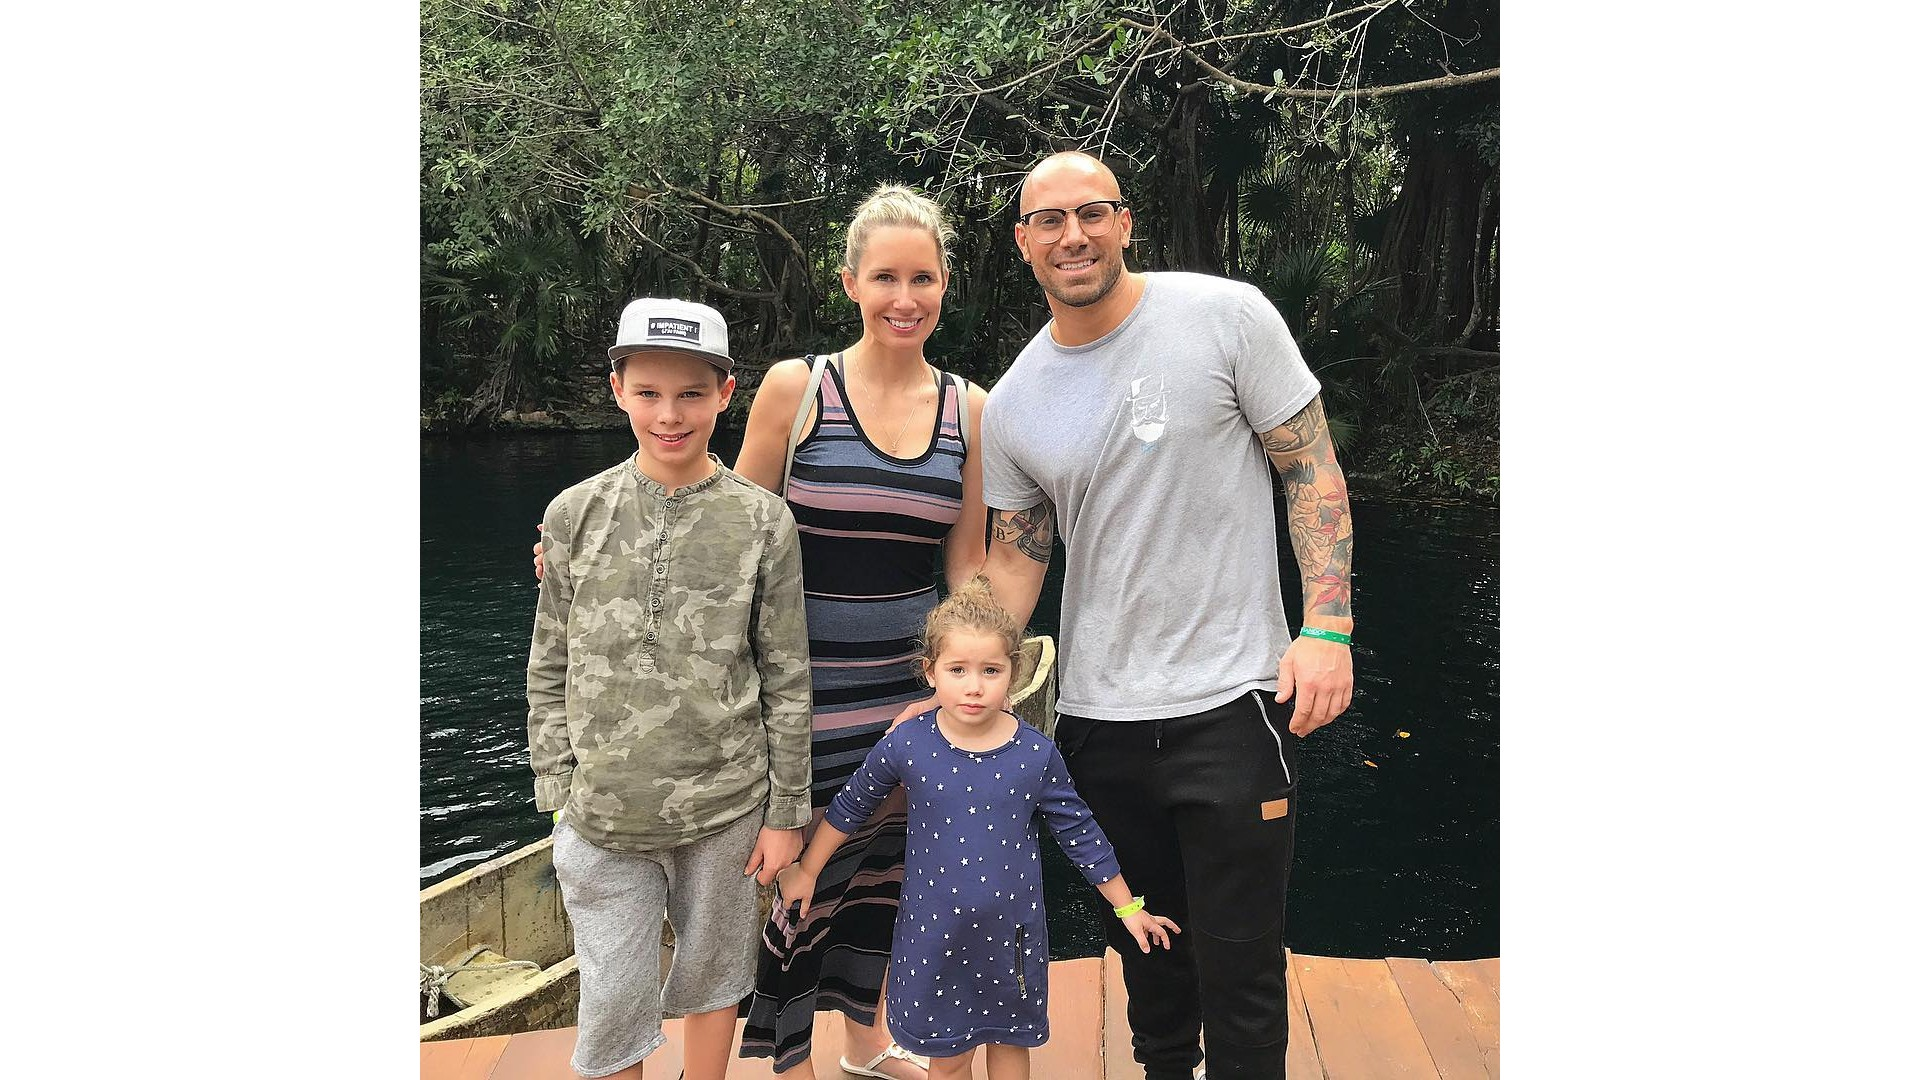 Maïka, son fils Hayden, Étienne et leur fille Anna